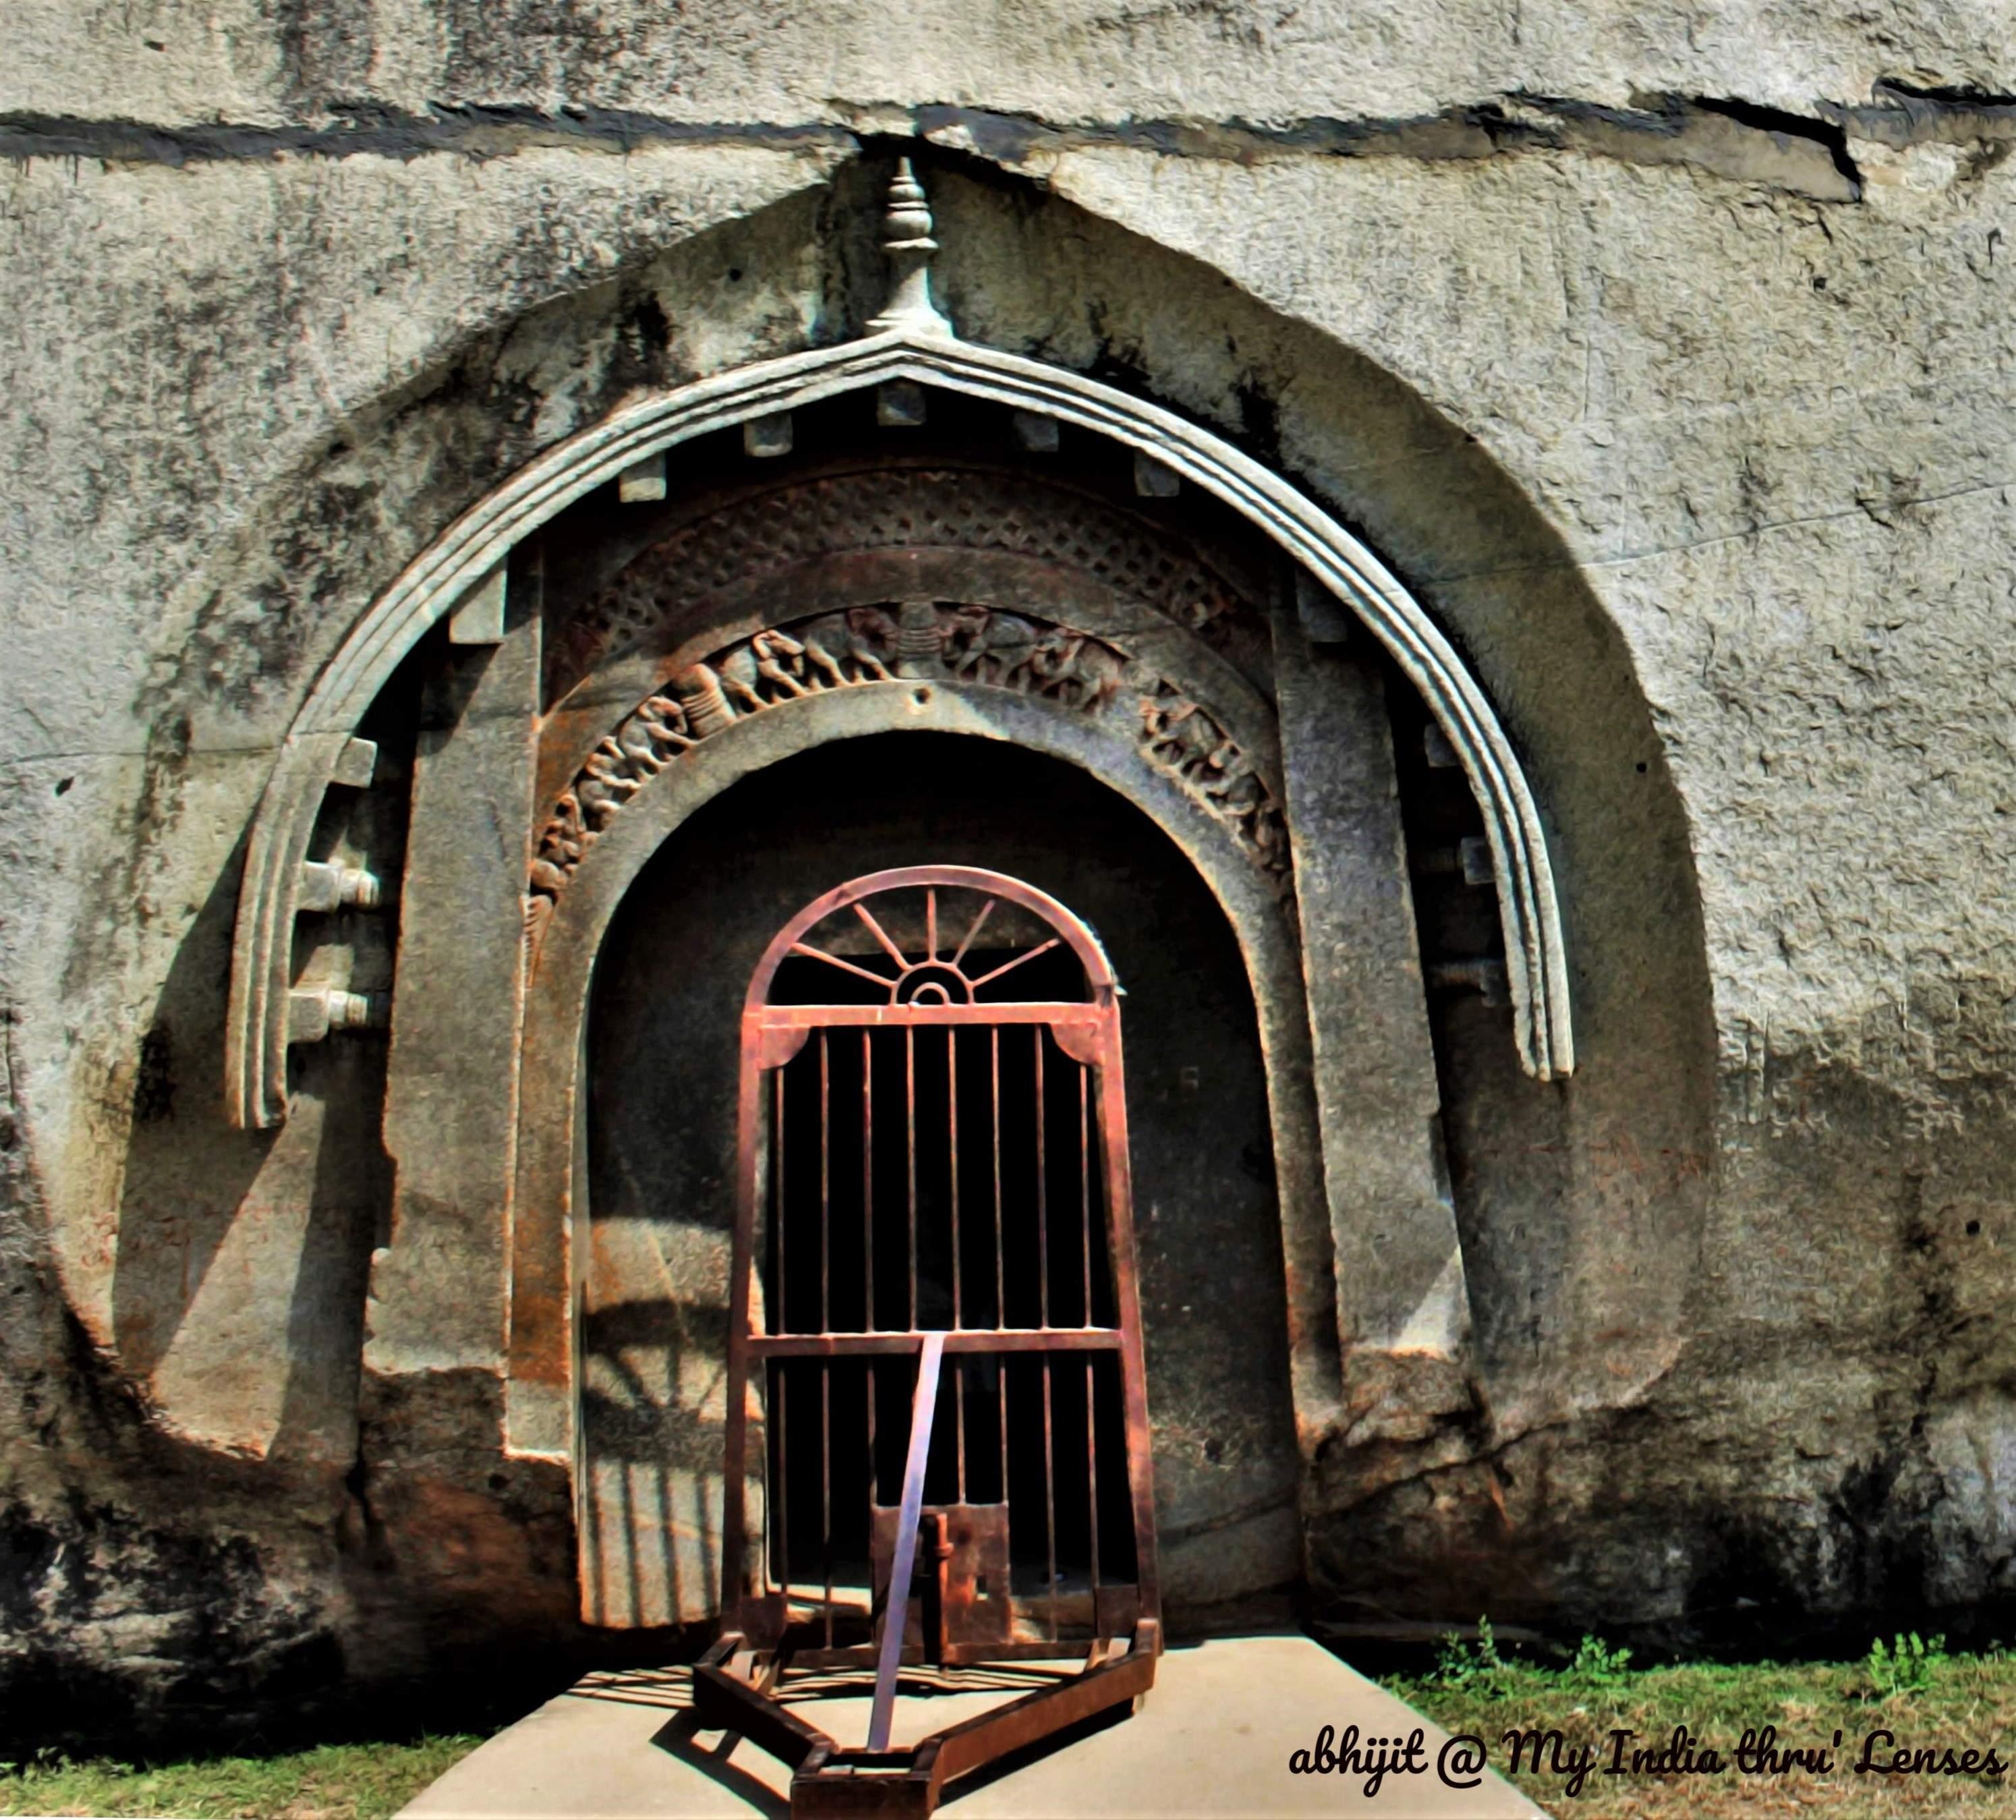 The Ornate Entrance of Lomas Rishi Cave